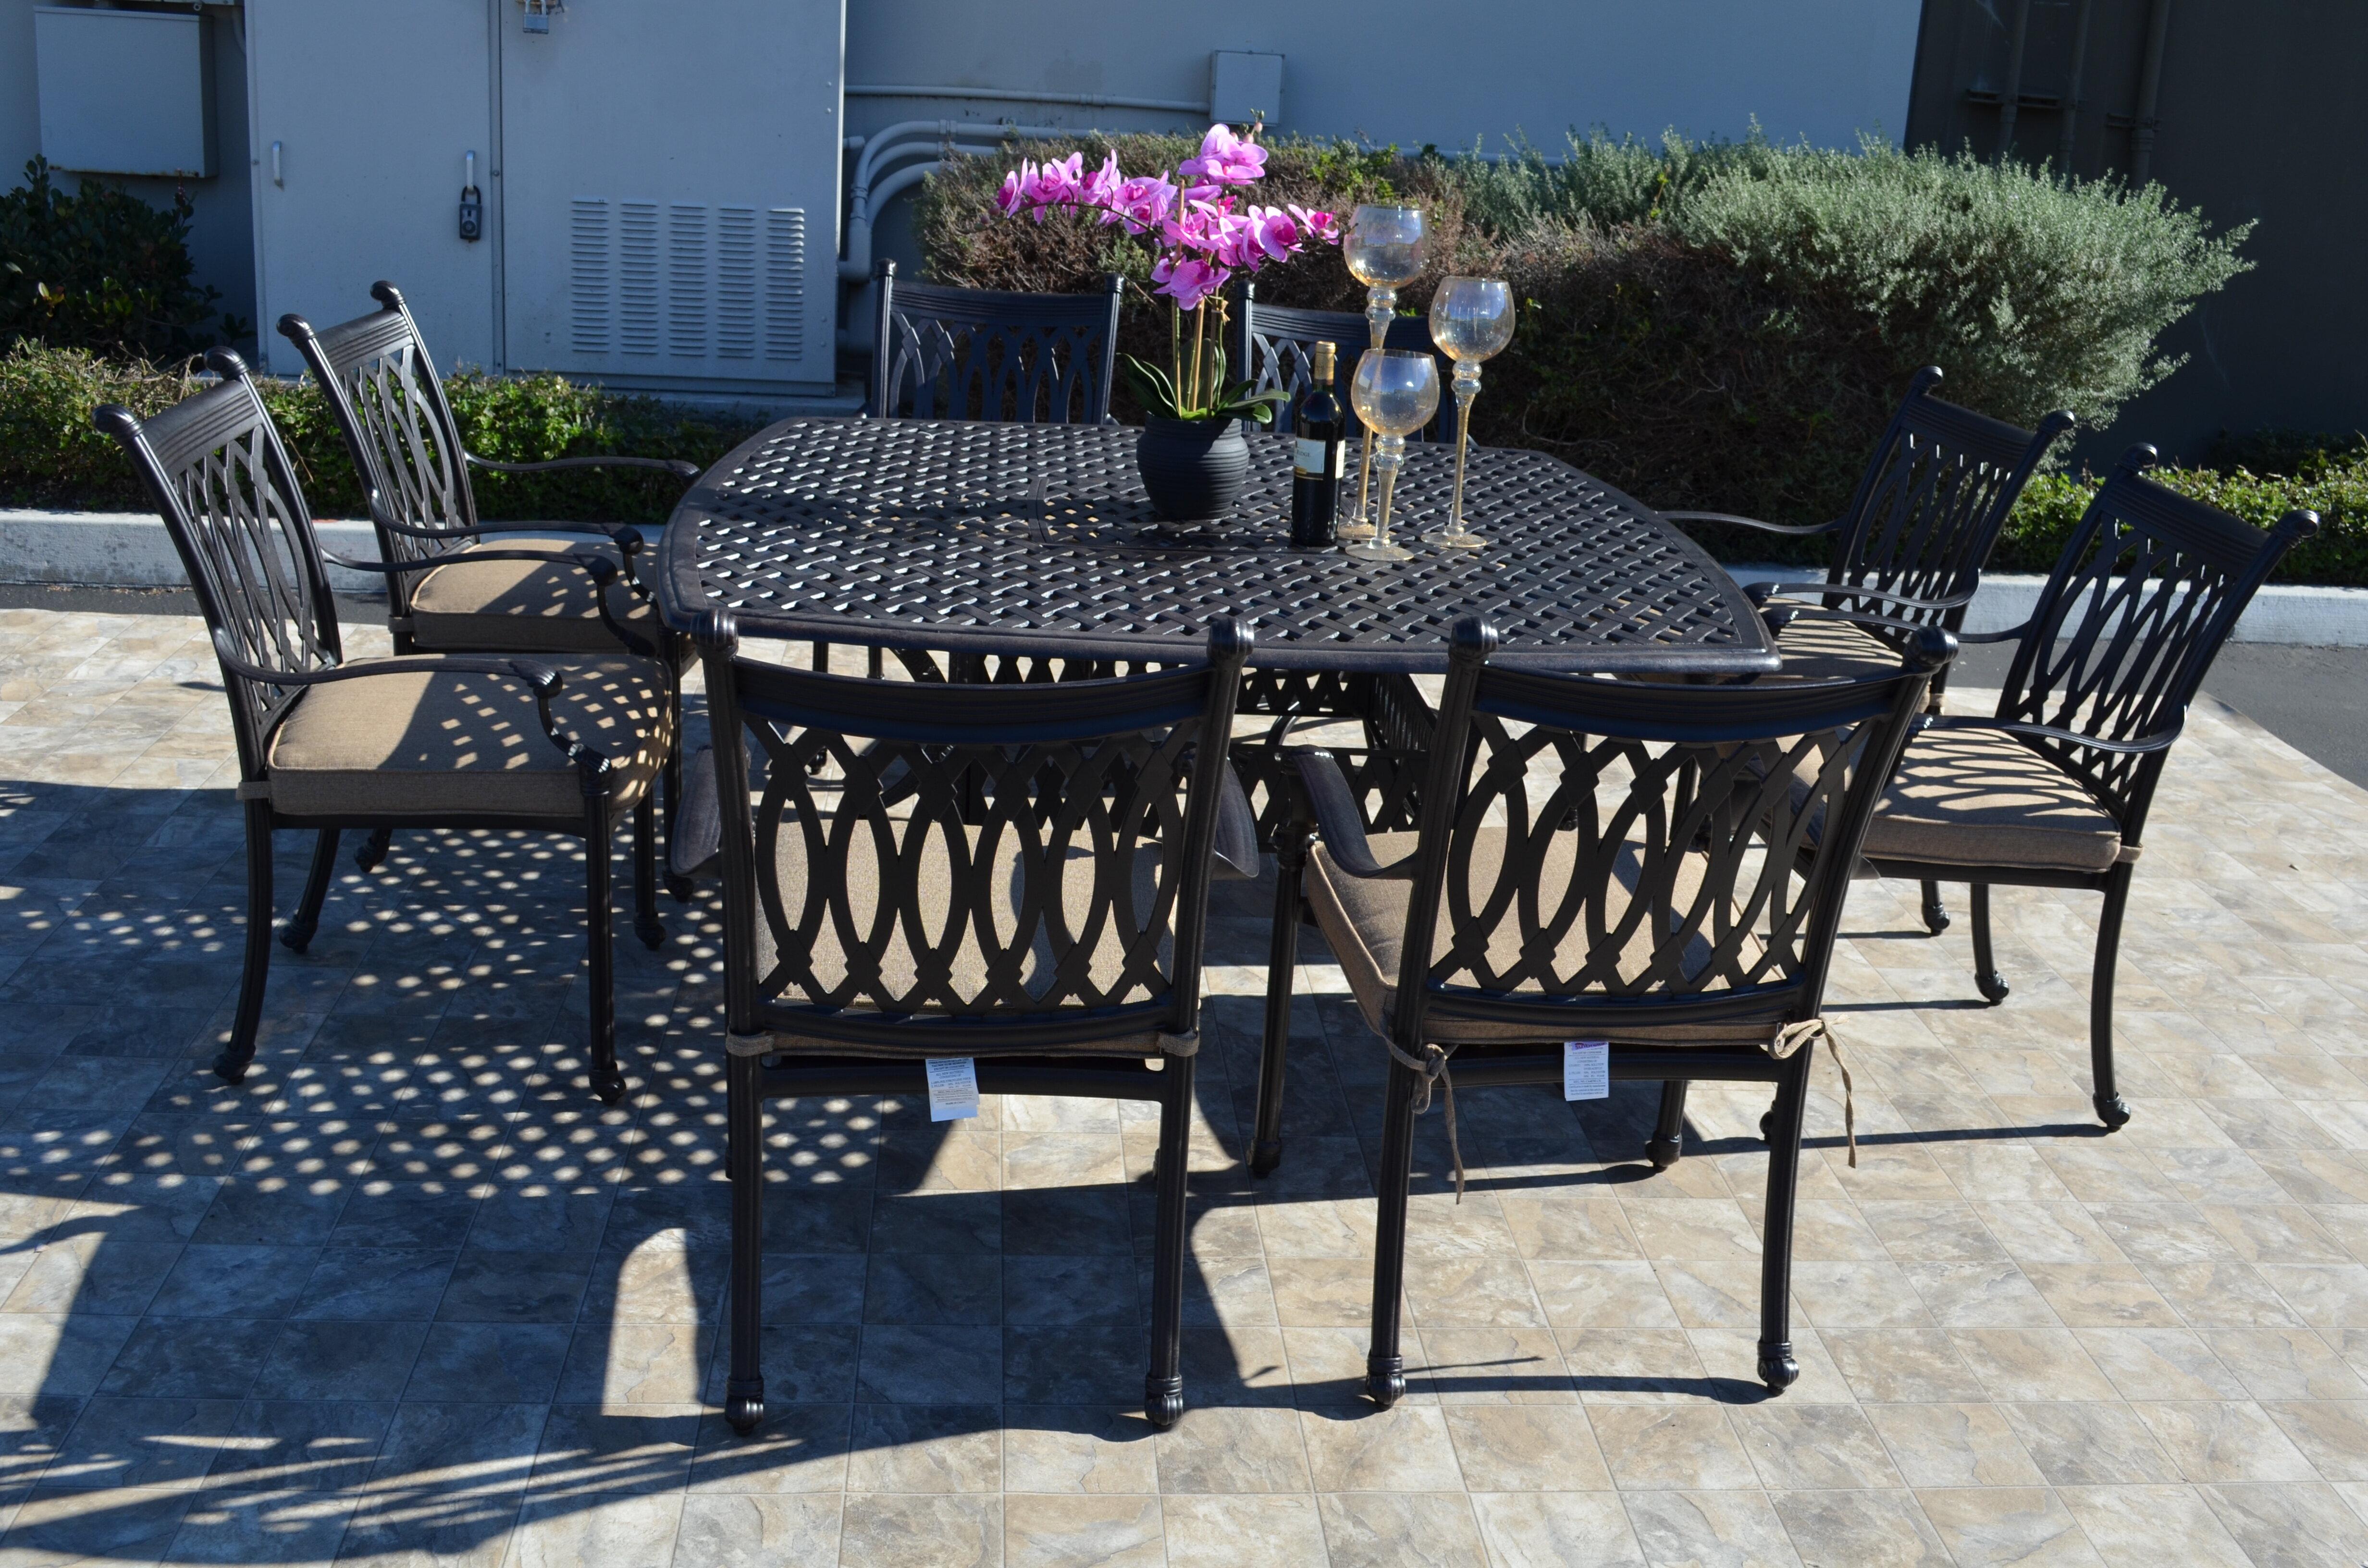 Tremendous Baragrey 9 Piece Sunbrella Dining Set With Cushions Cjindustries Chair Design For Home Cjindustriesco